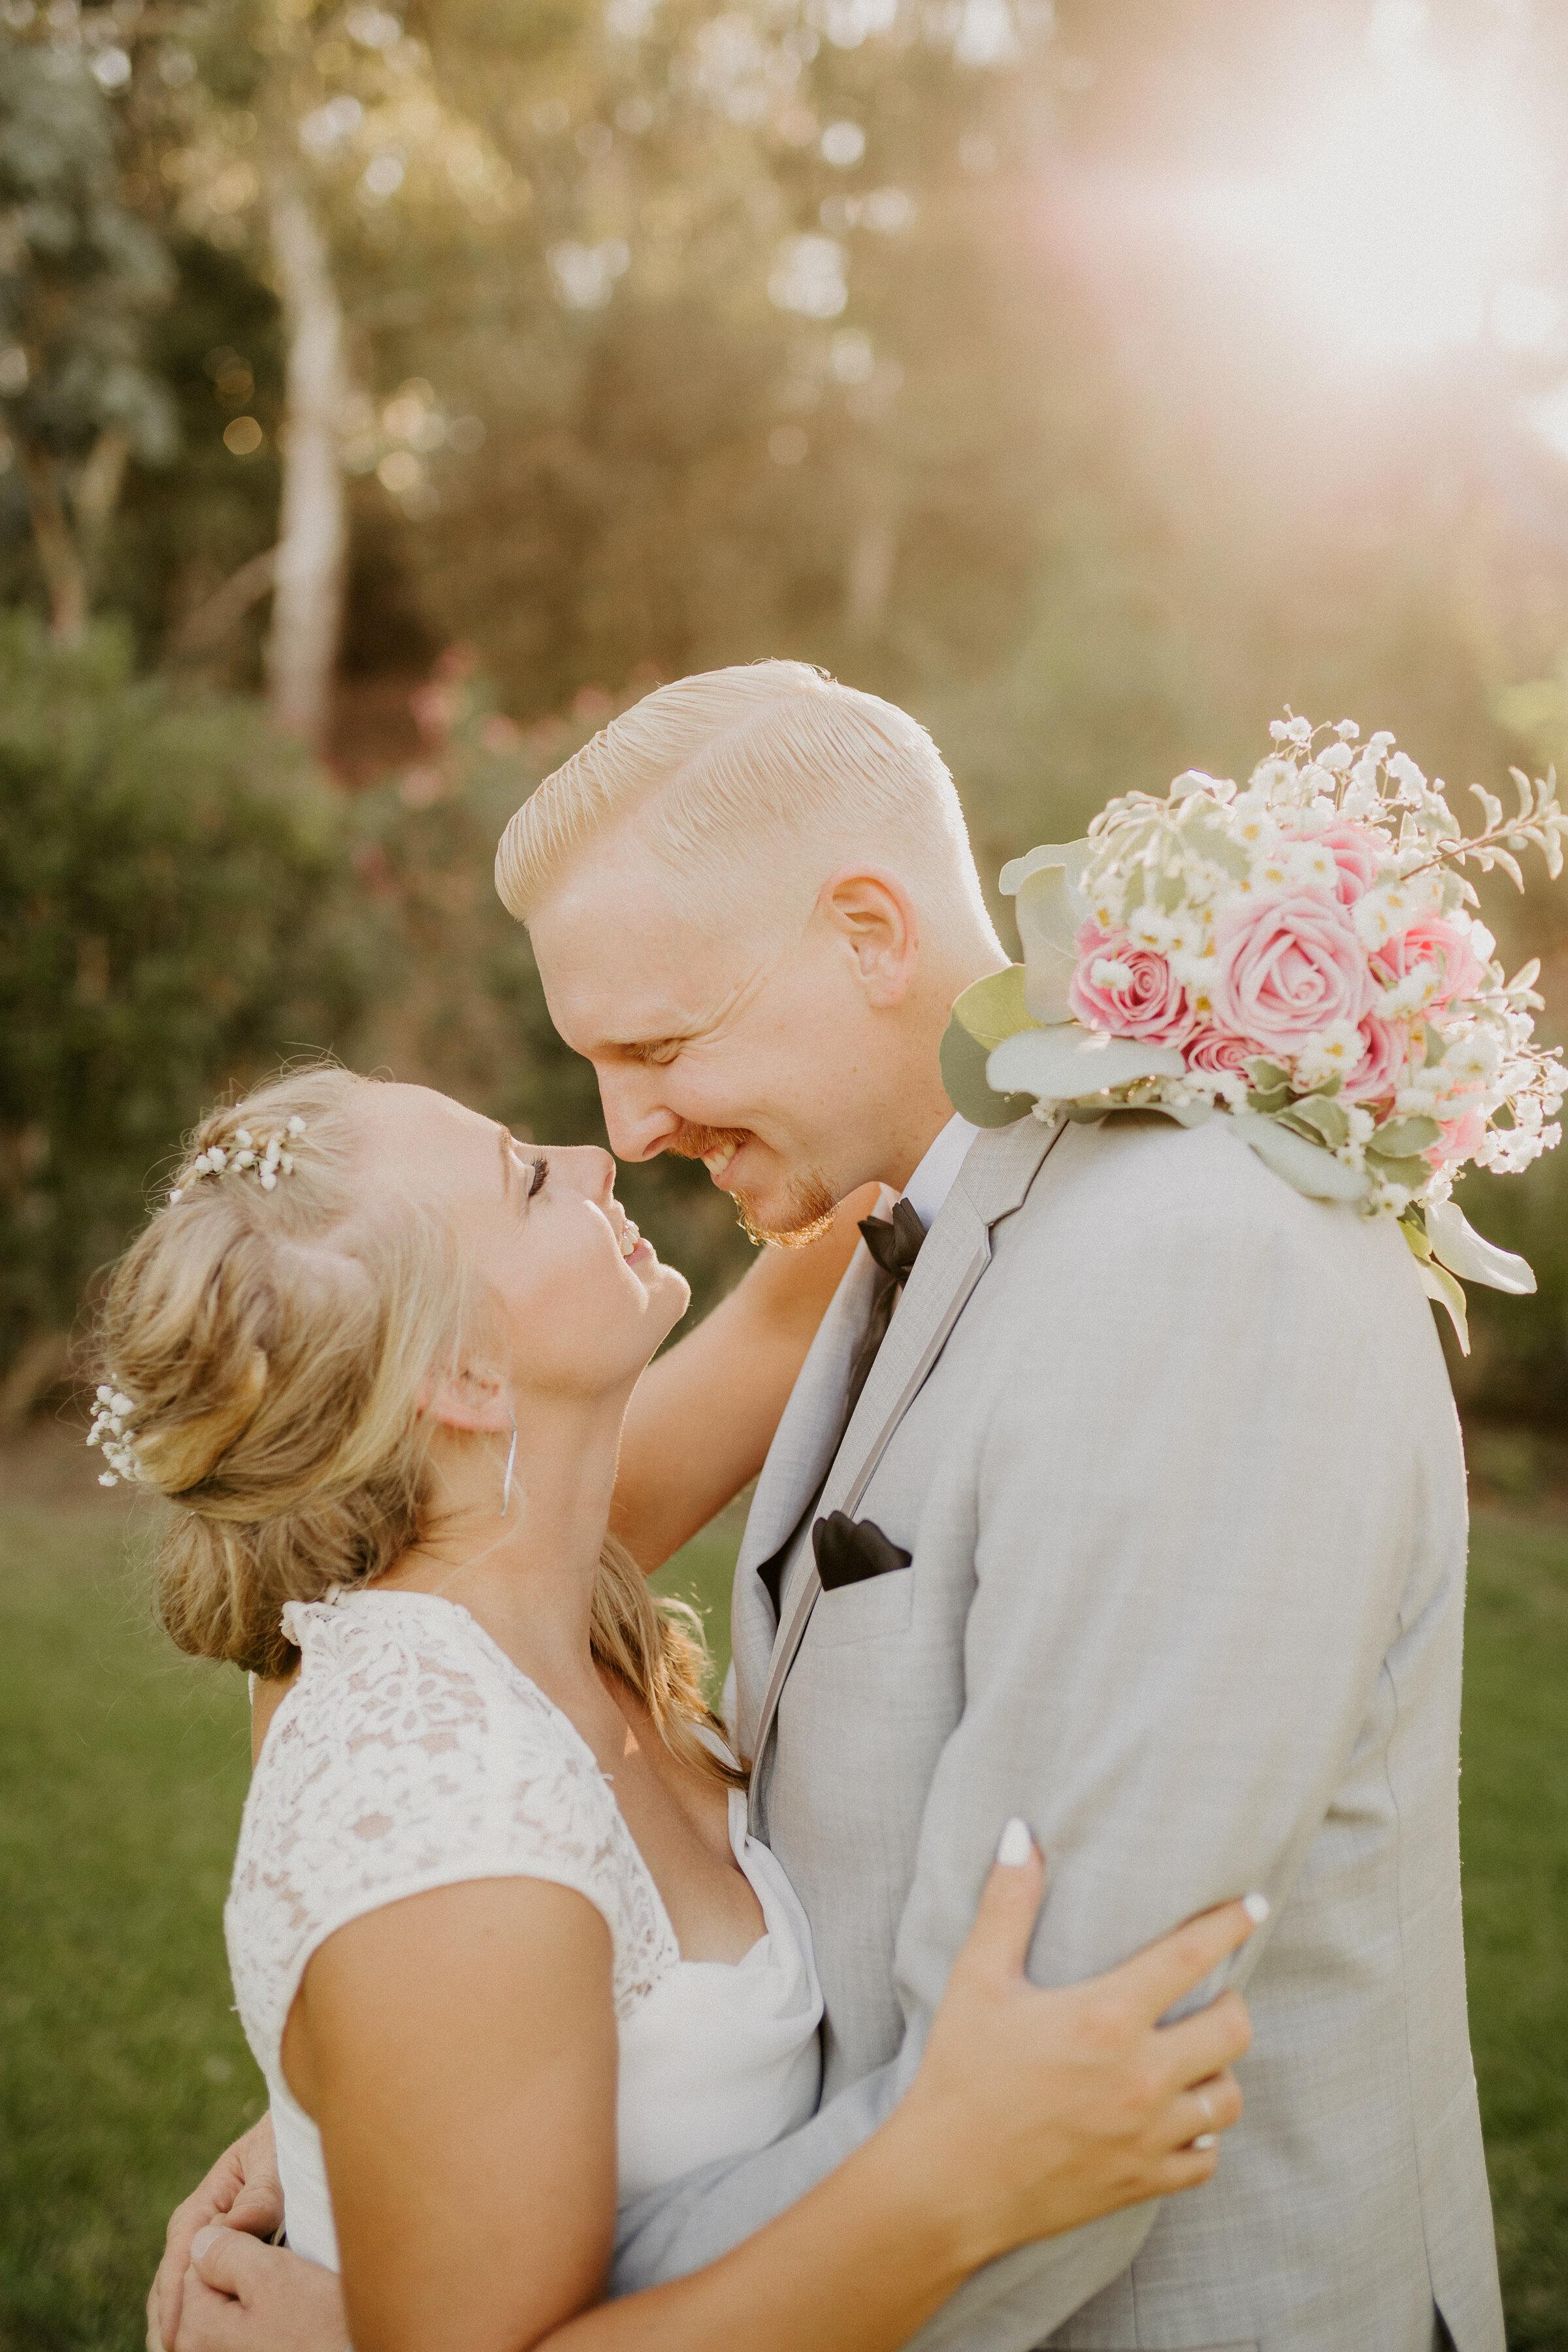 amphoto kj vowel renewal bridals-292.jpg